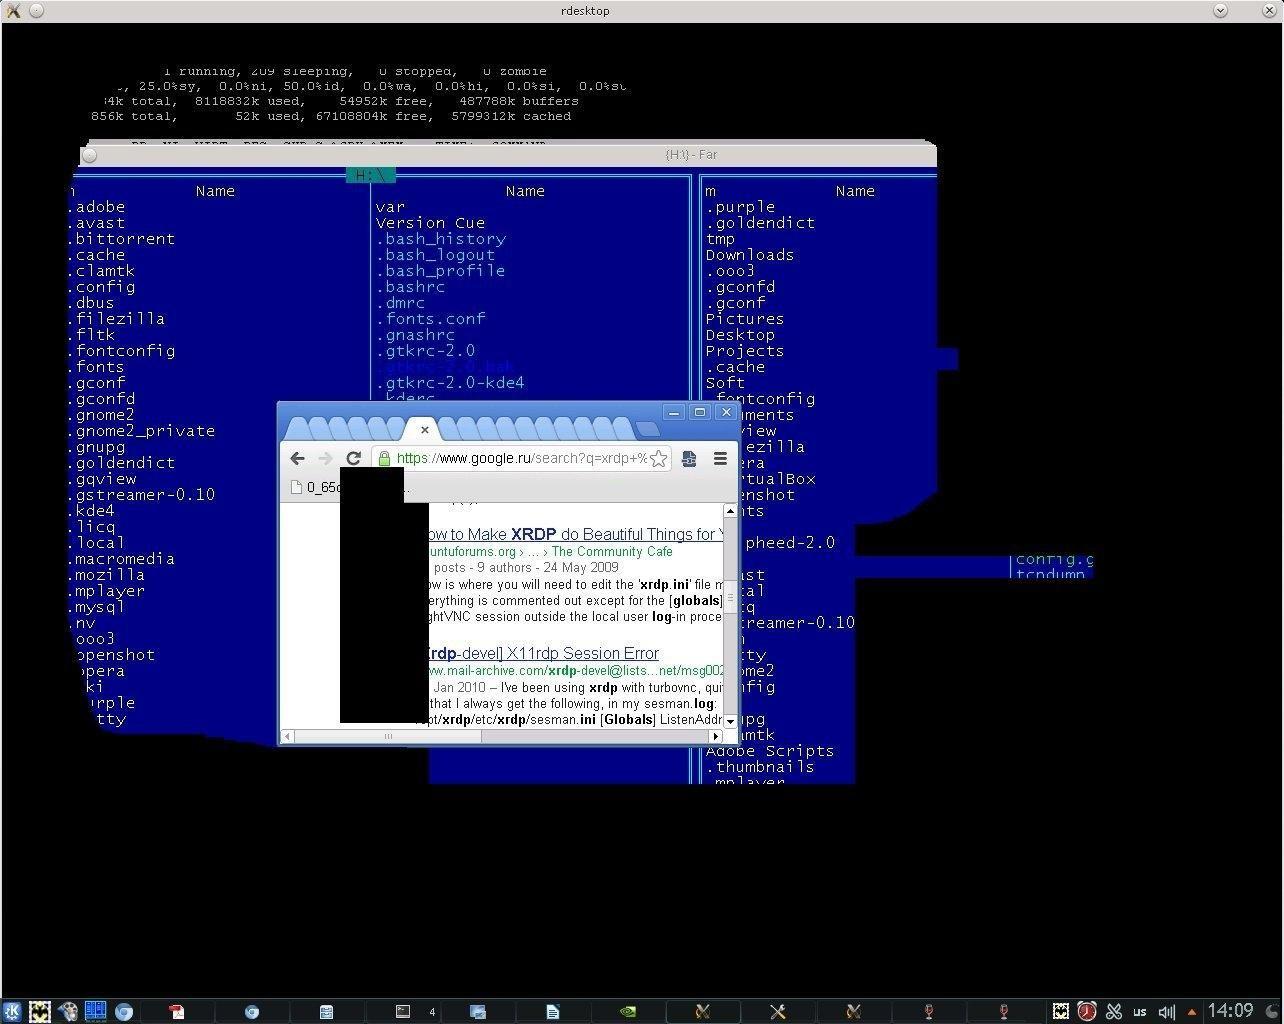 rdesktop / Bugs / #361 Black screen when switching from Full